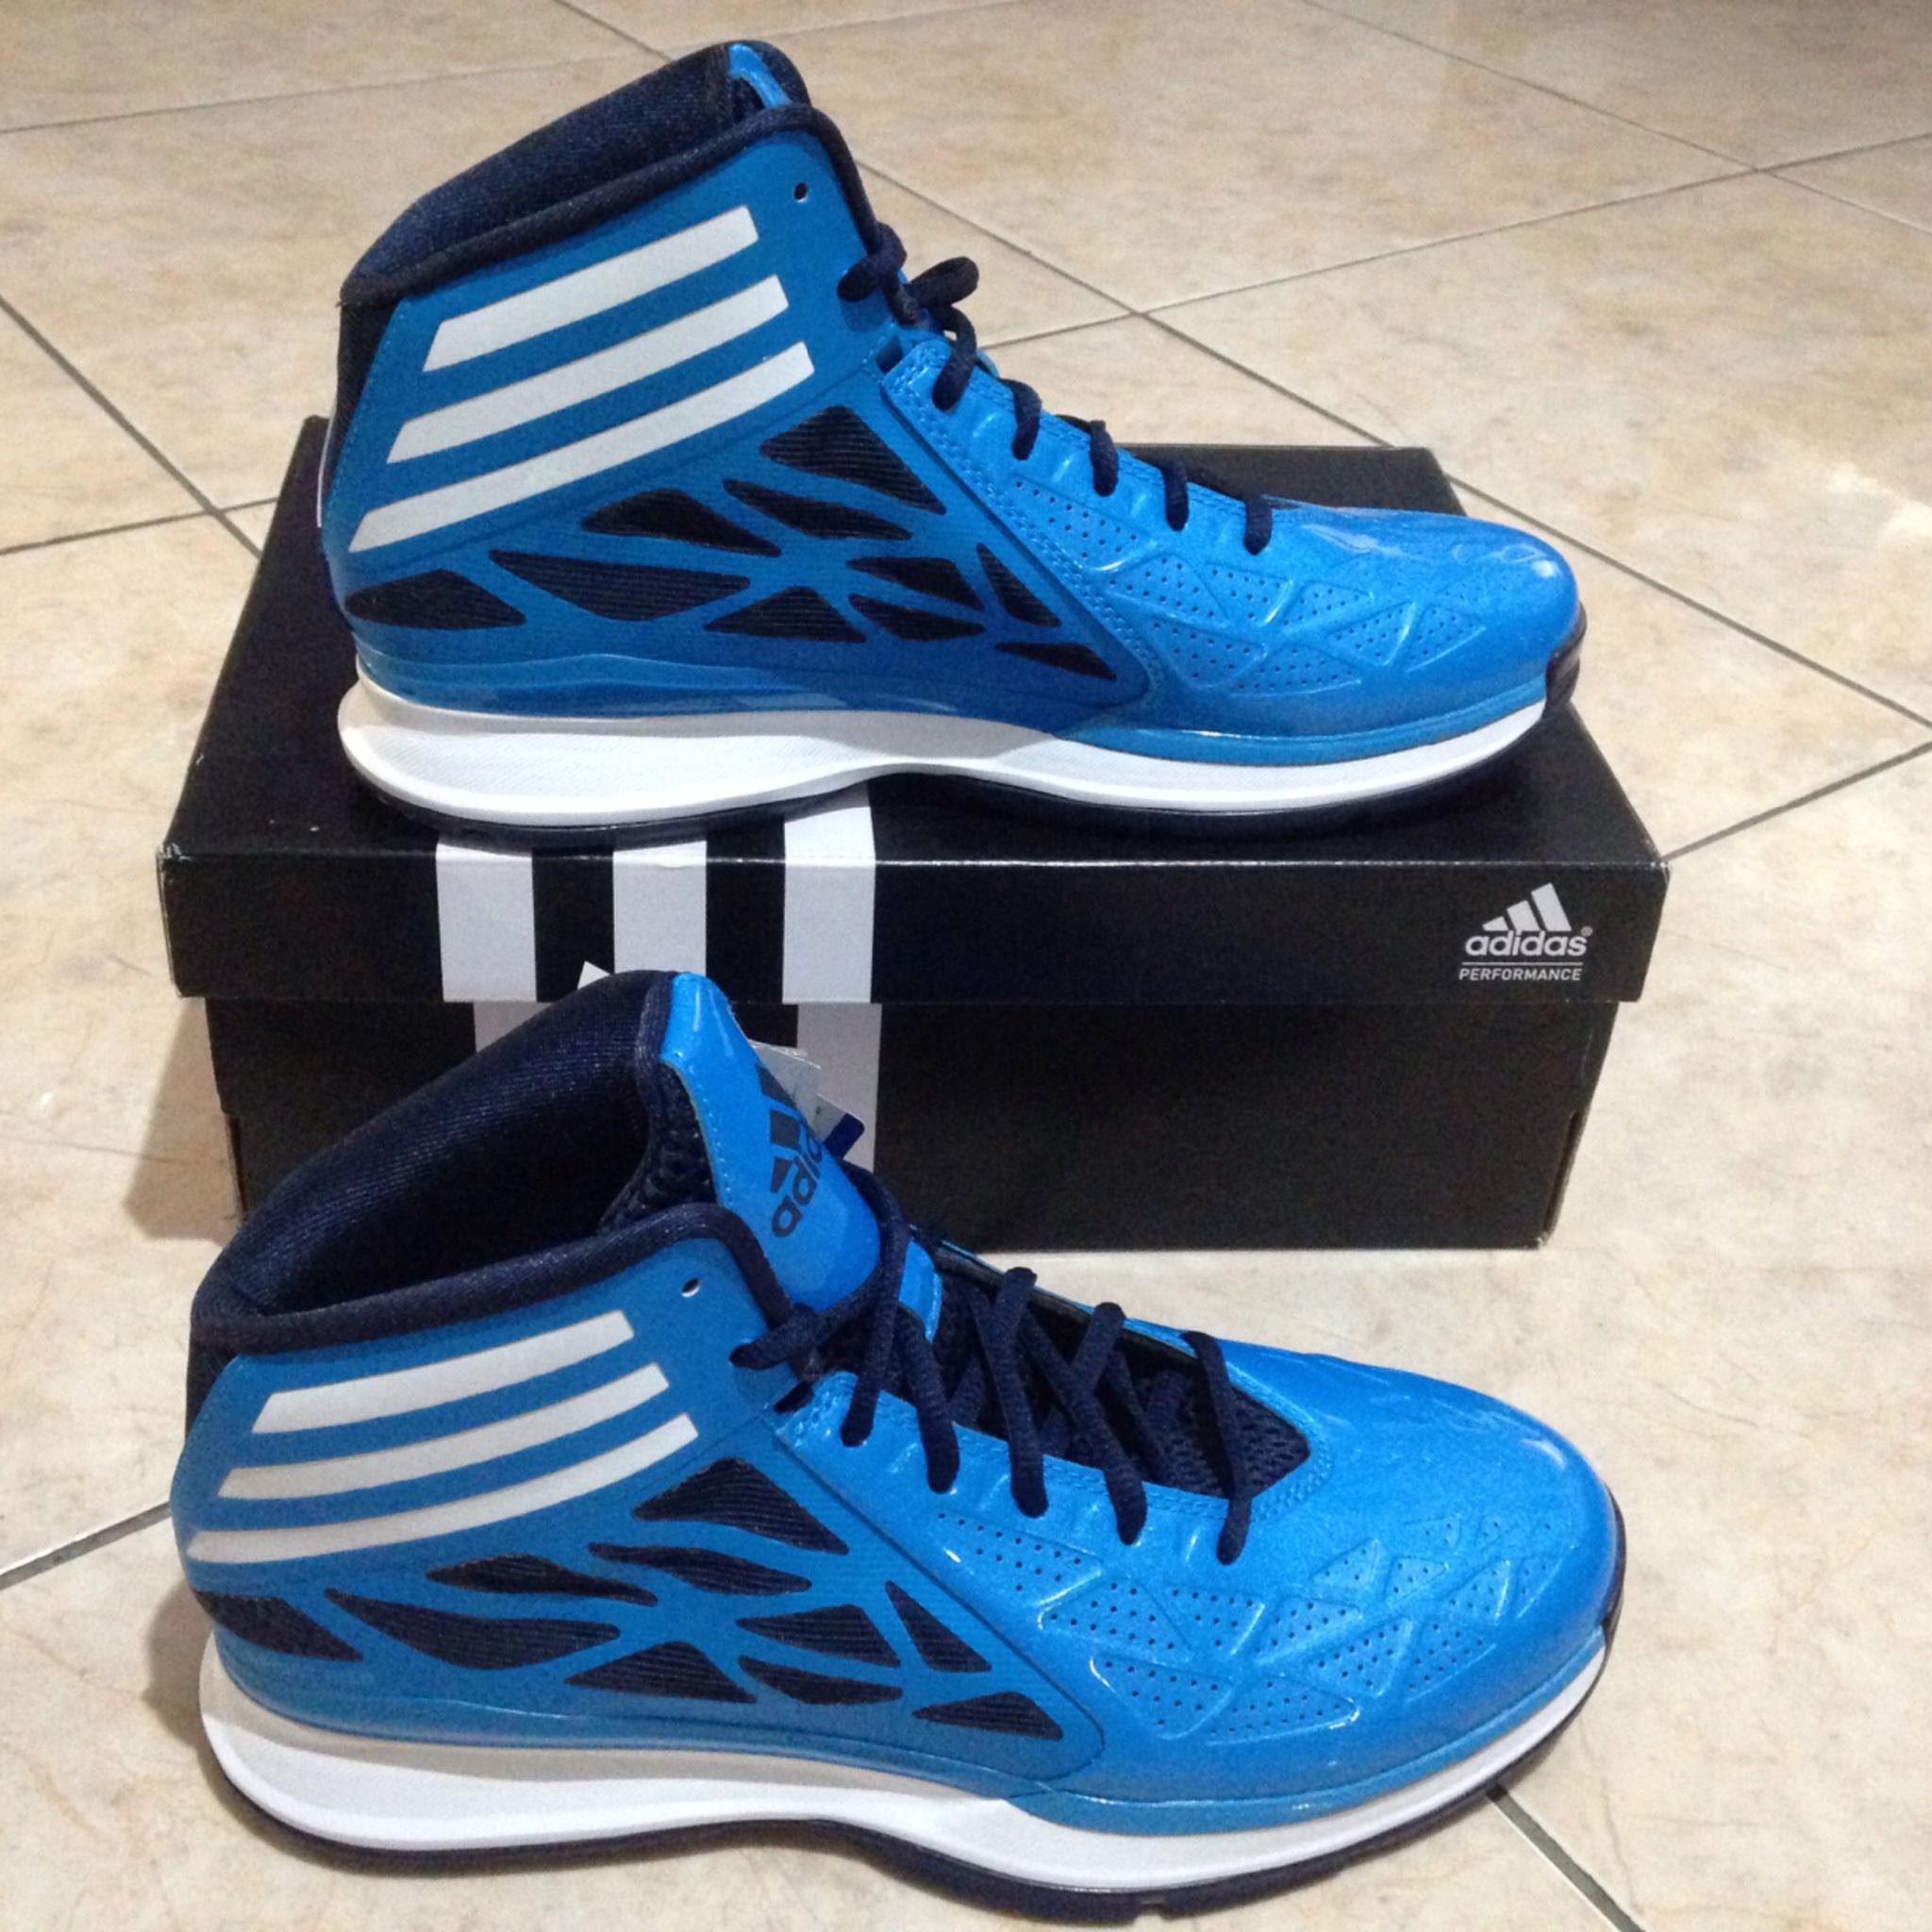 Jual Adidas Crazy Fast 2 Biru. Sepatu Basket - Sportsite  4ba3d8e5fc